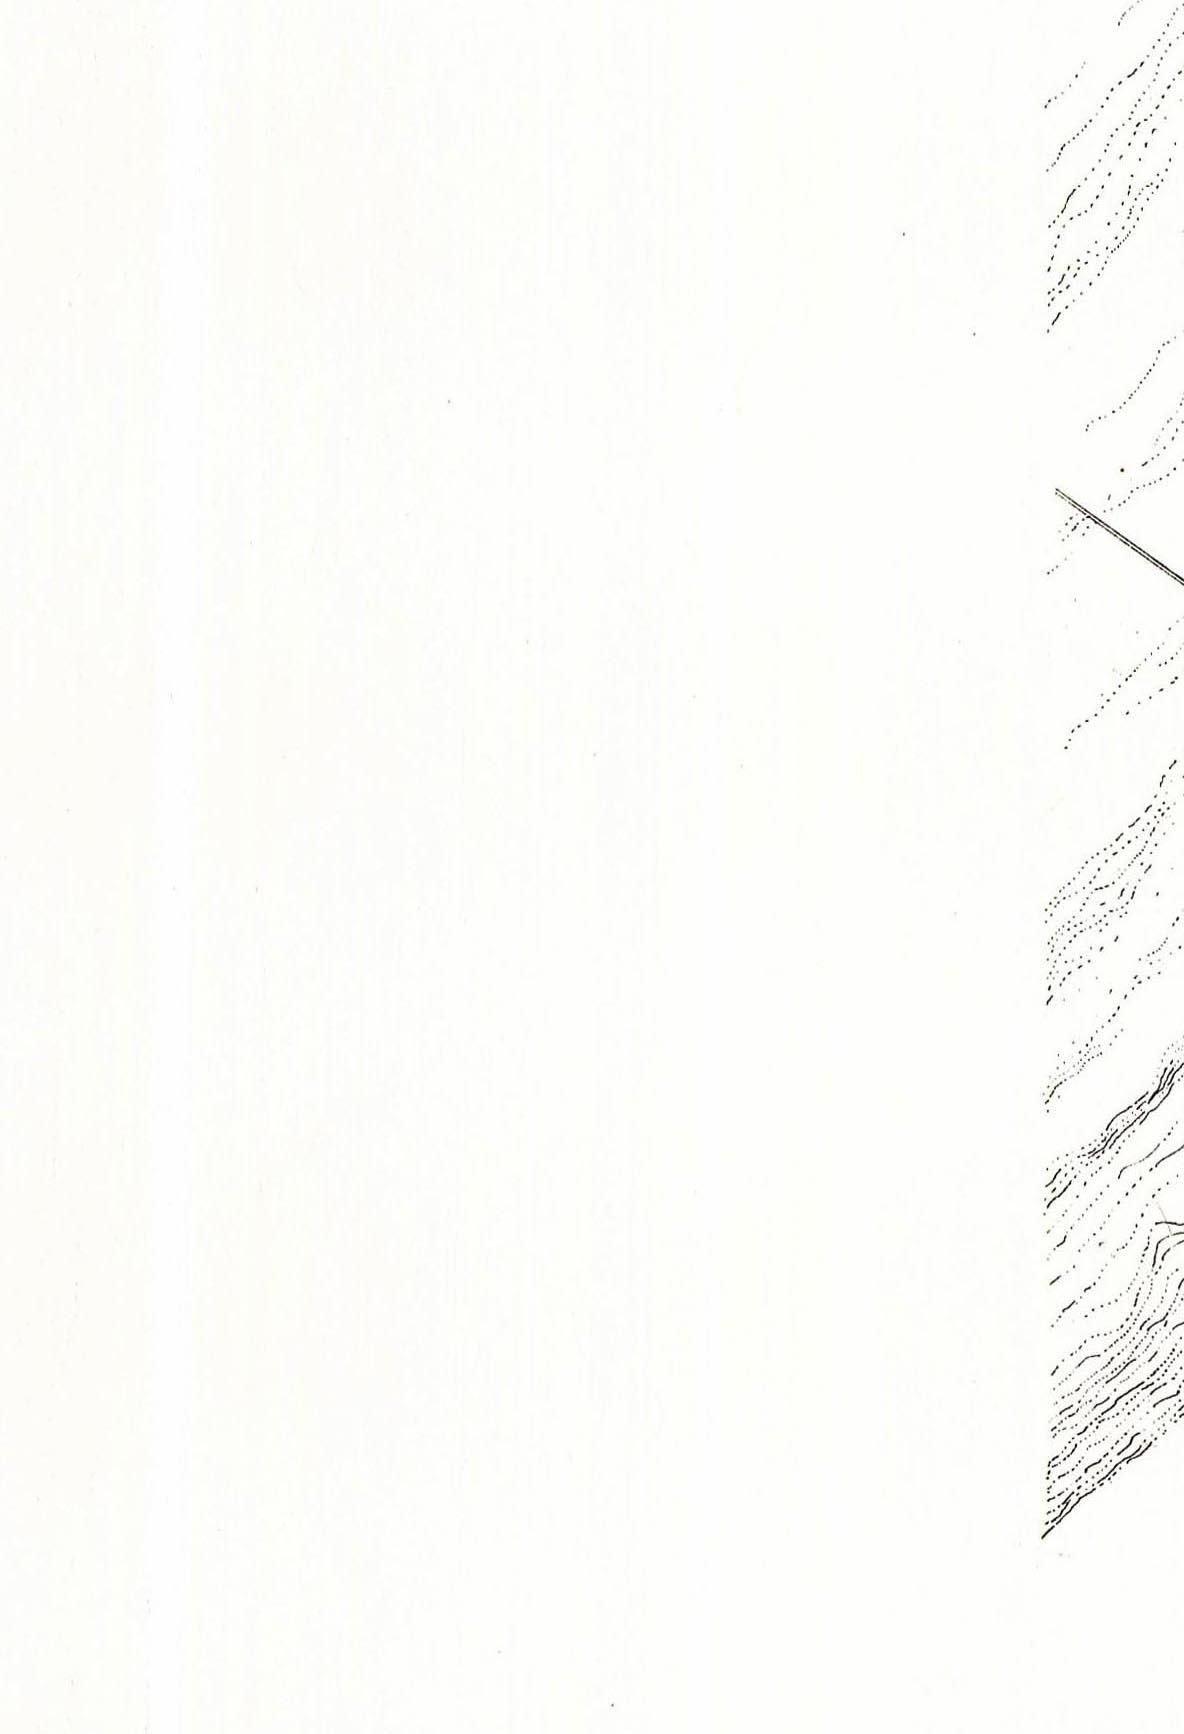 danielvillalobos-valladolid-blueprints-renaissance-g.1